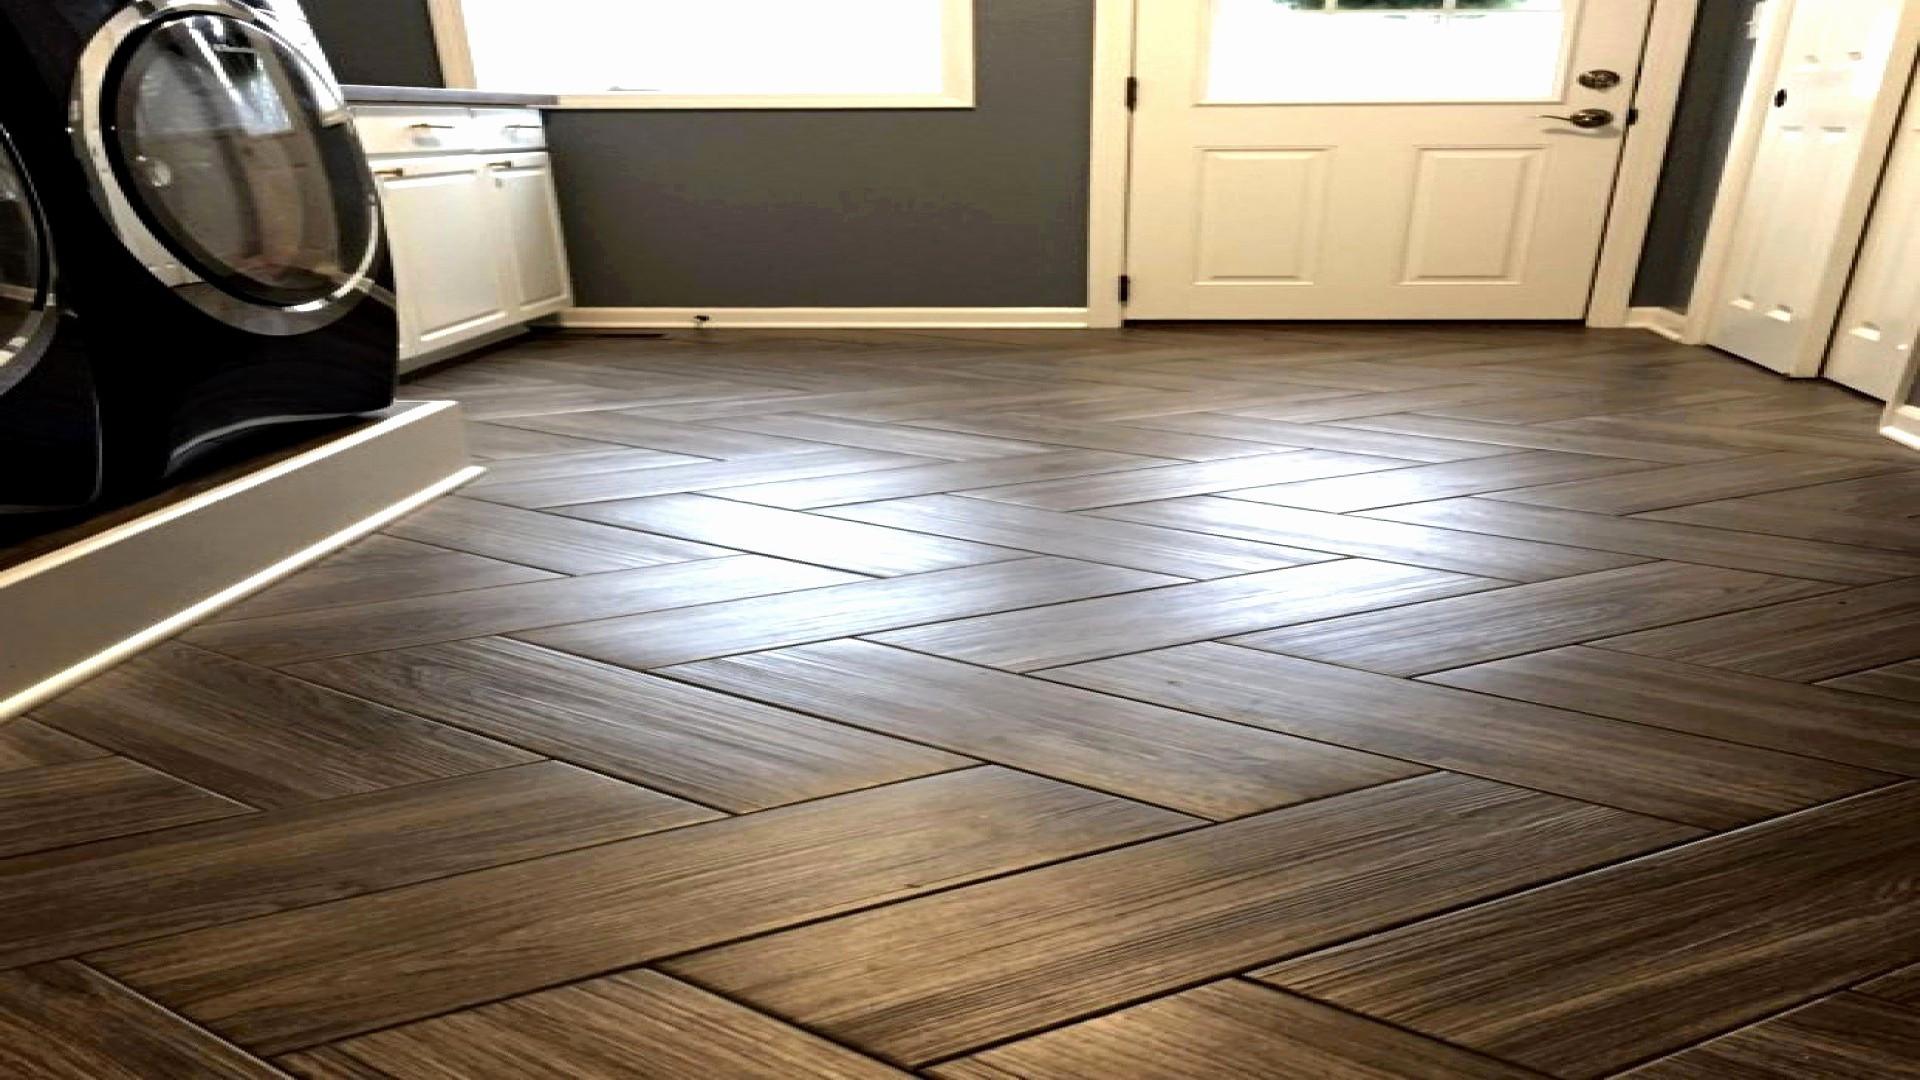 21 Lovely 7 Hardwood Flooring 2021 free download 7 hardwood flooring of 19 awesome hardwood flooring for sale photograph dizpos com for hardwood flooring for sale best of 52 luxury wood flooring sale 52 s photograph